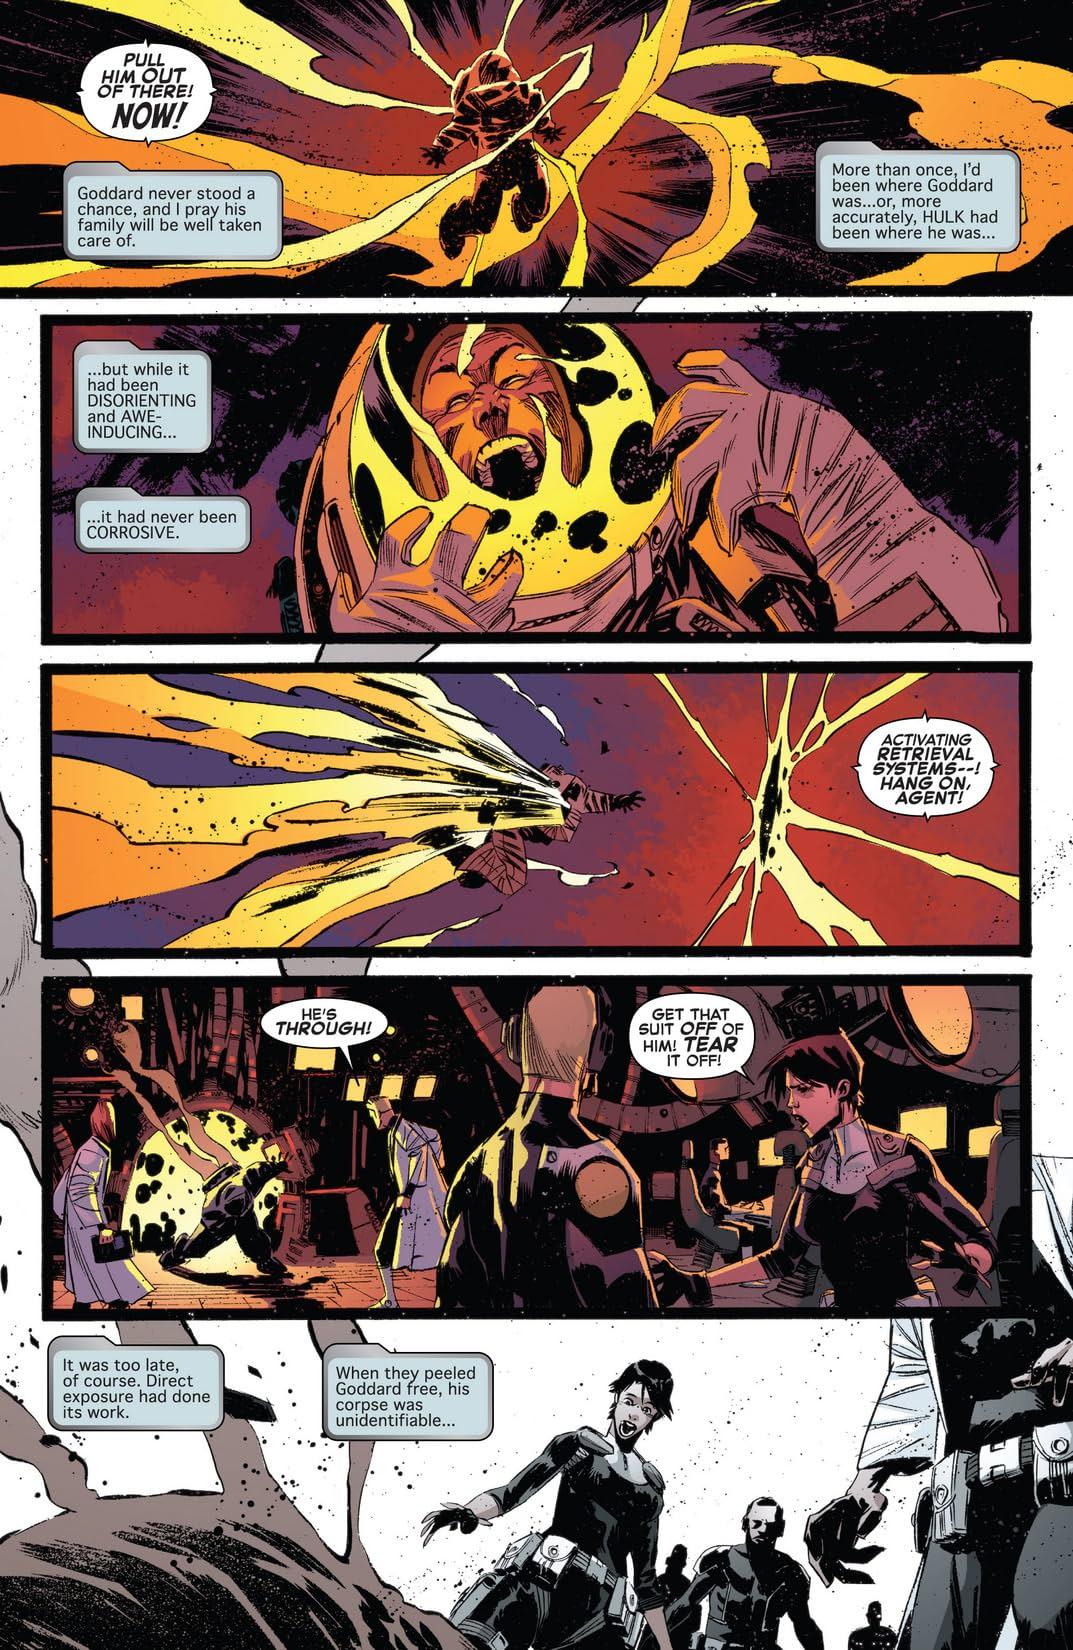 Indestructible Hulk Vol. 3: S.M.A.S.H. Time